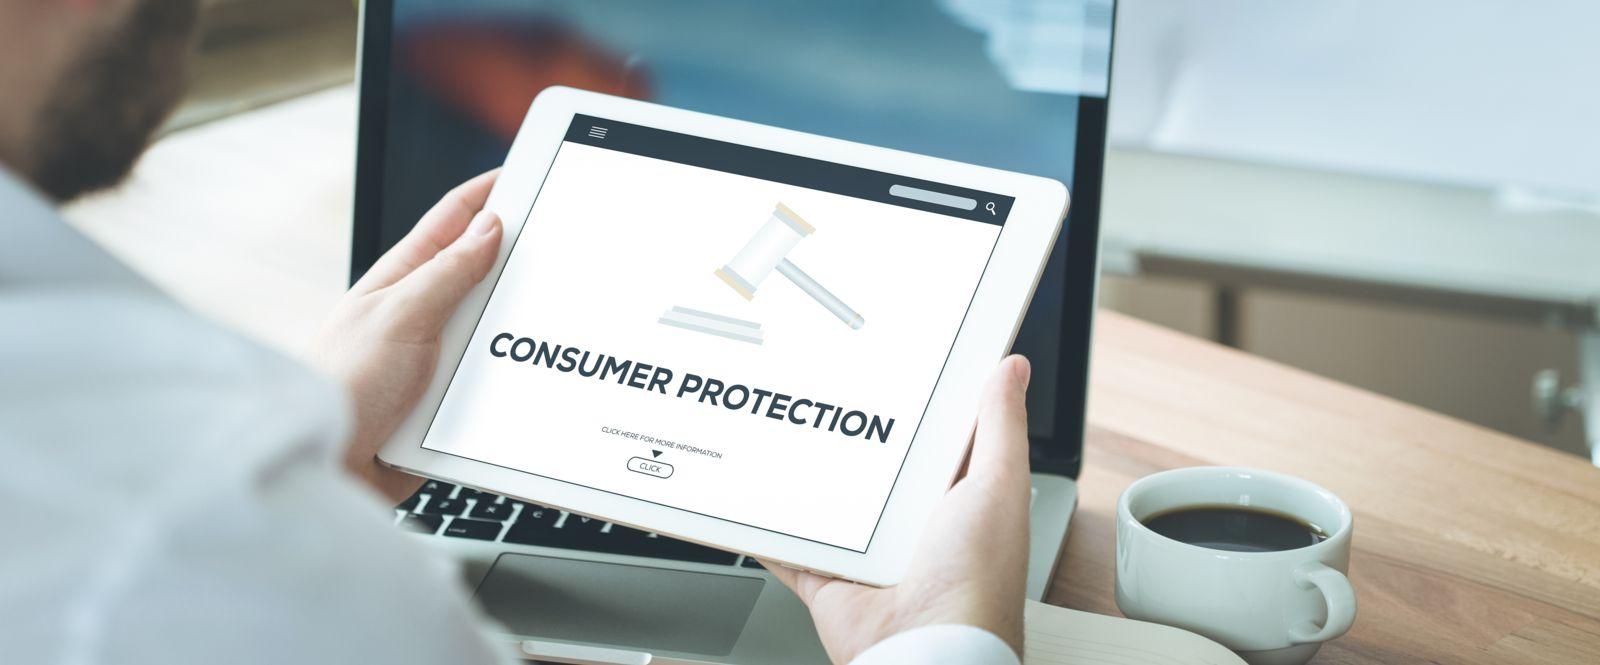 kansas city consumer protection attorneys